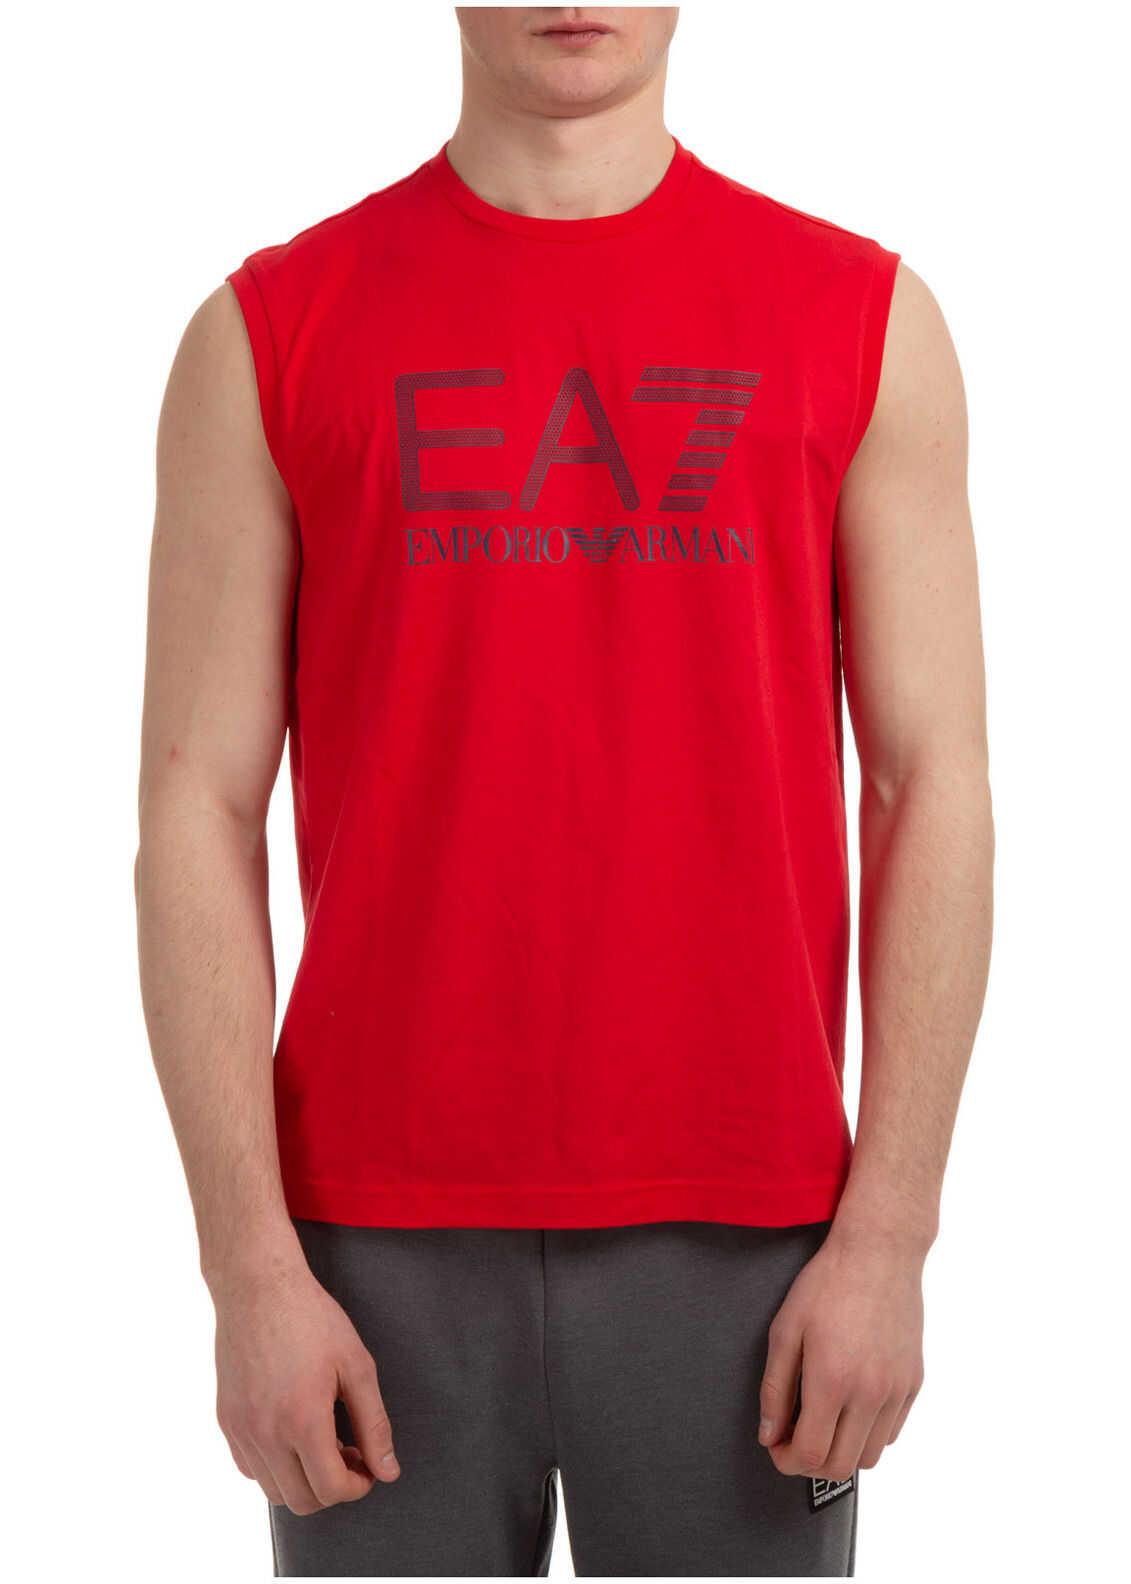 EA7 Sleeveless Tank Top T-Shirt Red imagine